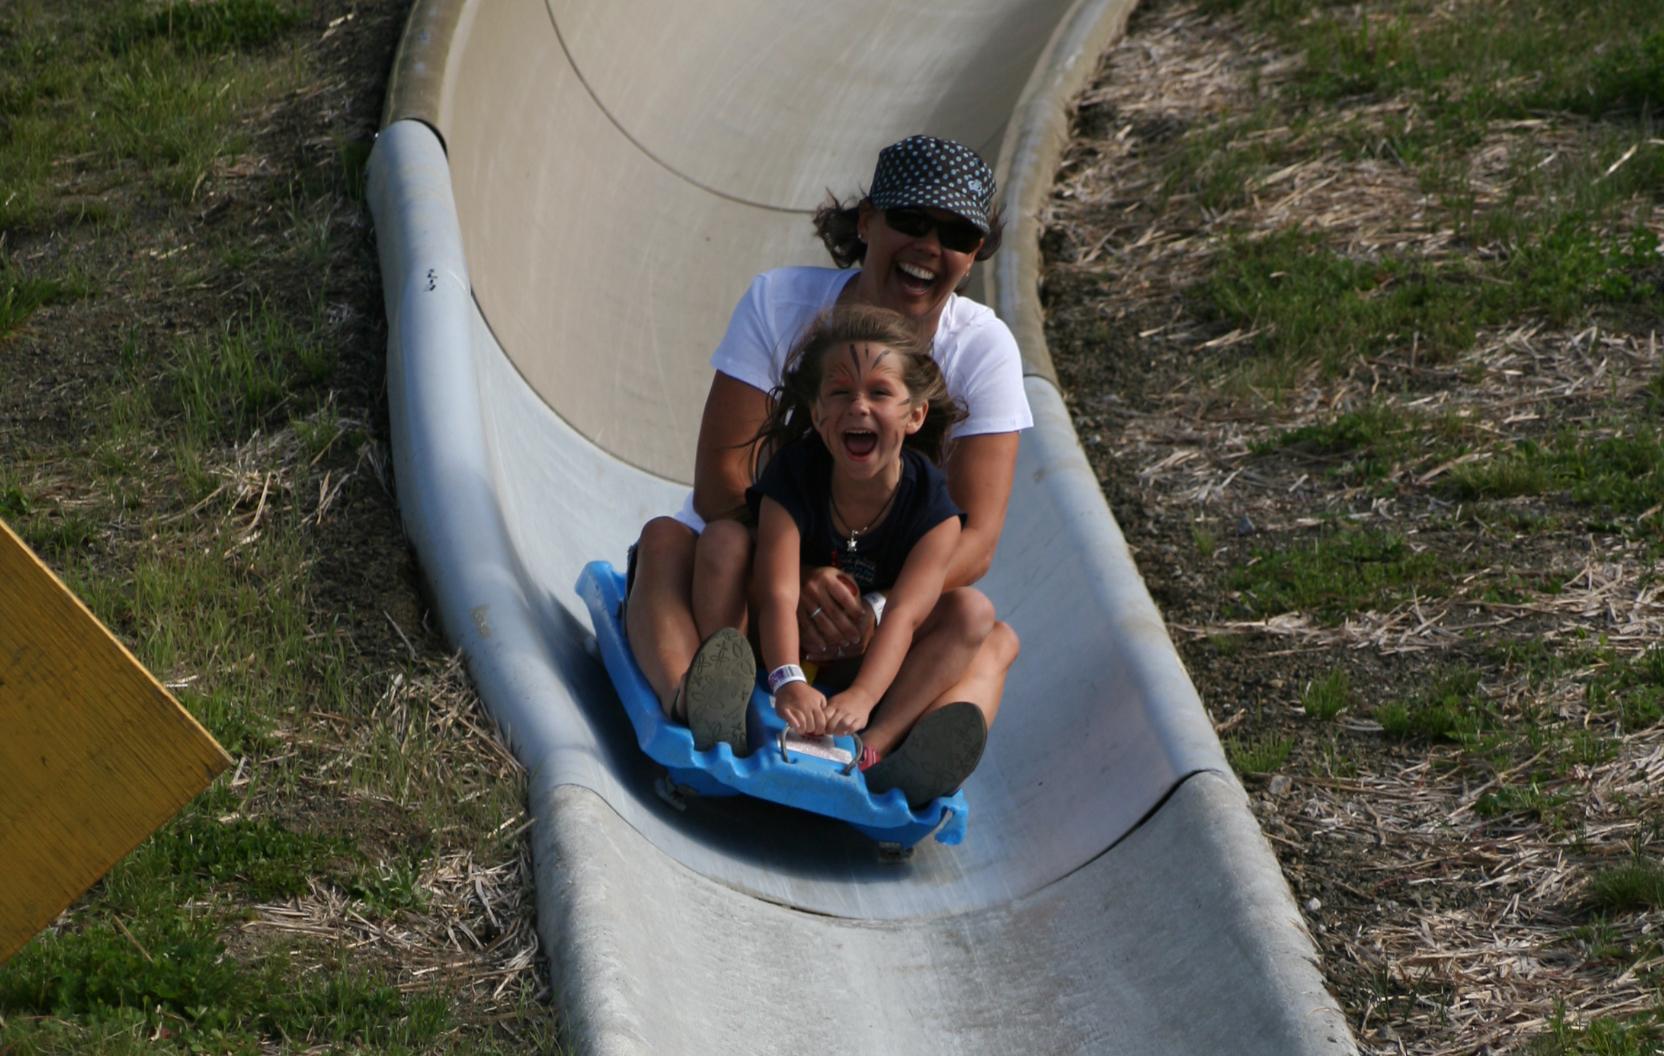 Alpine Slide at Mt. Hood Skibowl